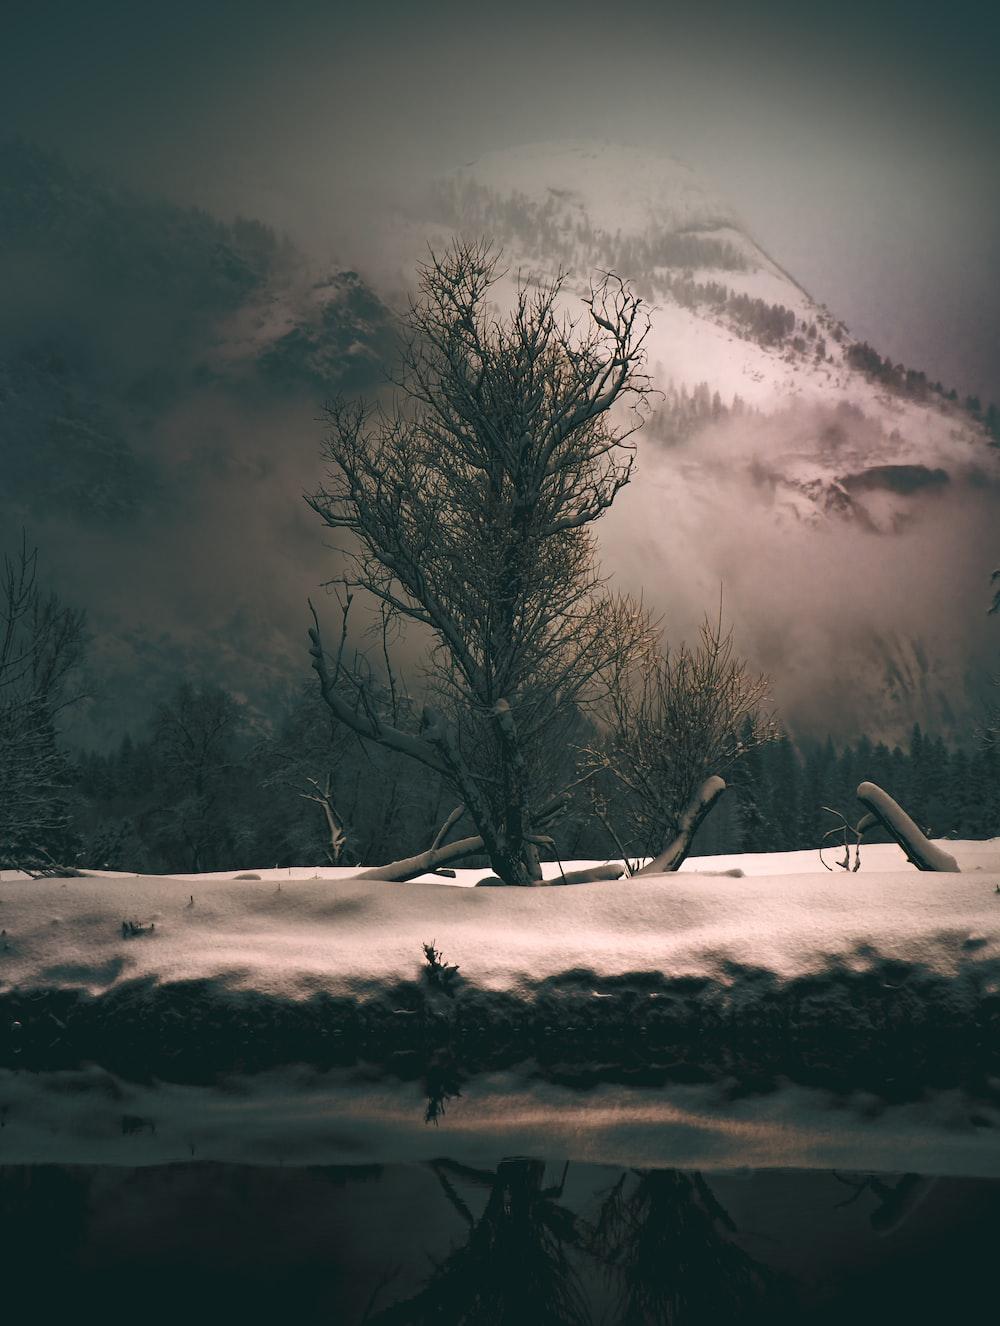 bare tree near snow capped mountain